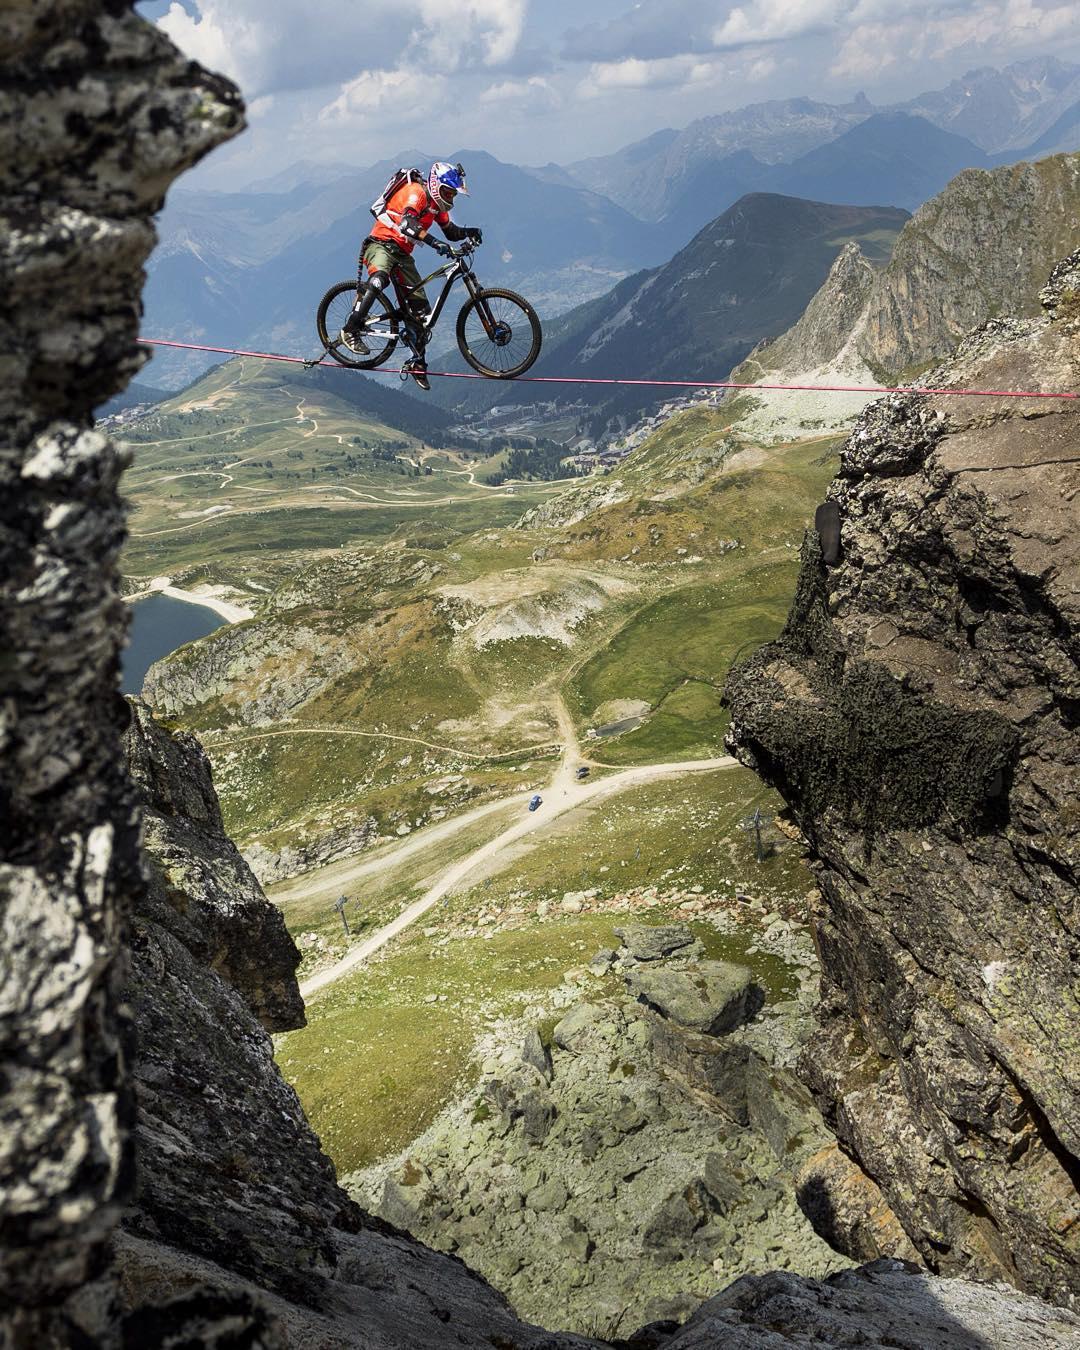 Life is like riding a bike. To keep balance, you must keep moving.